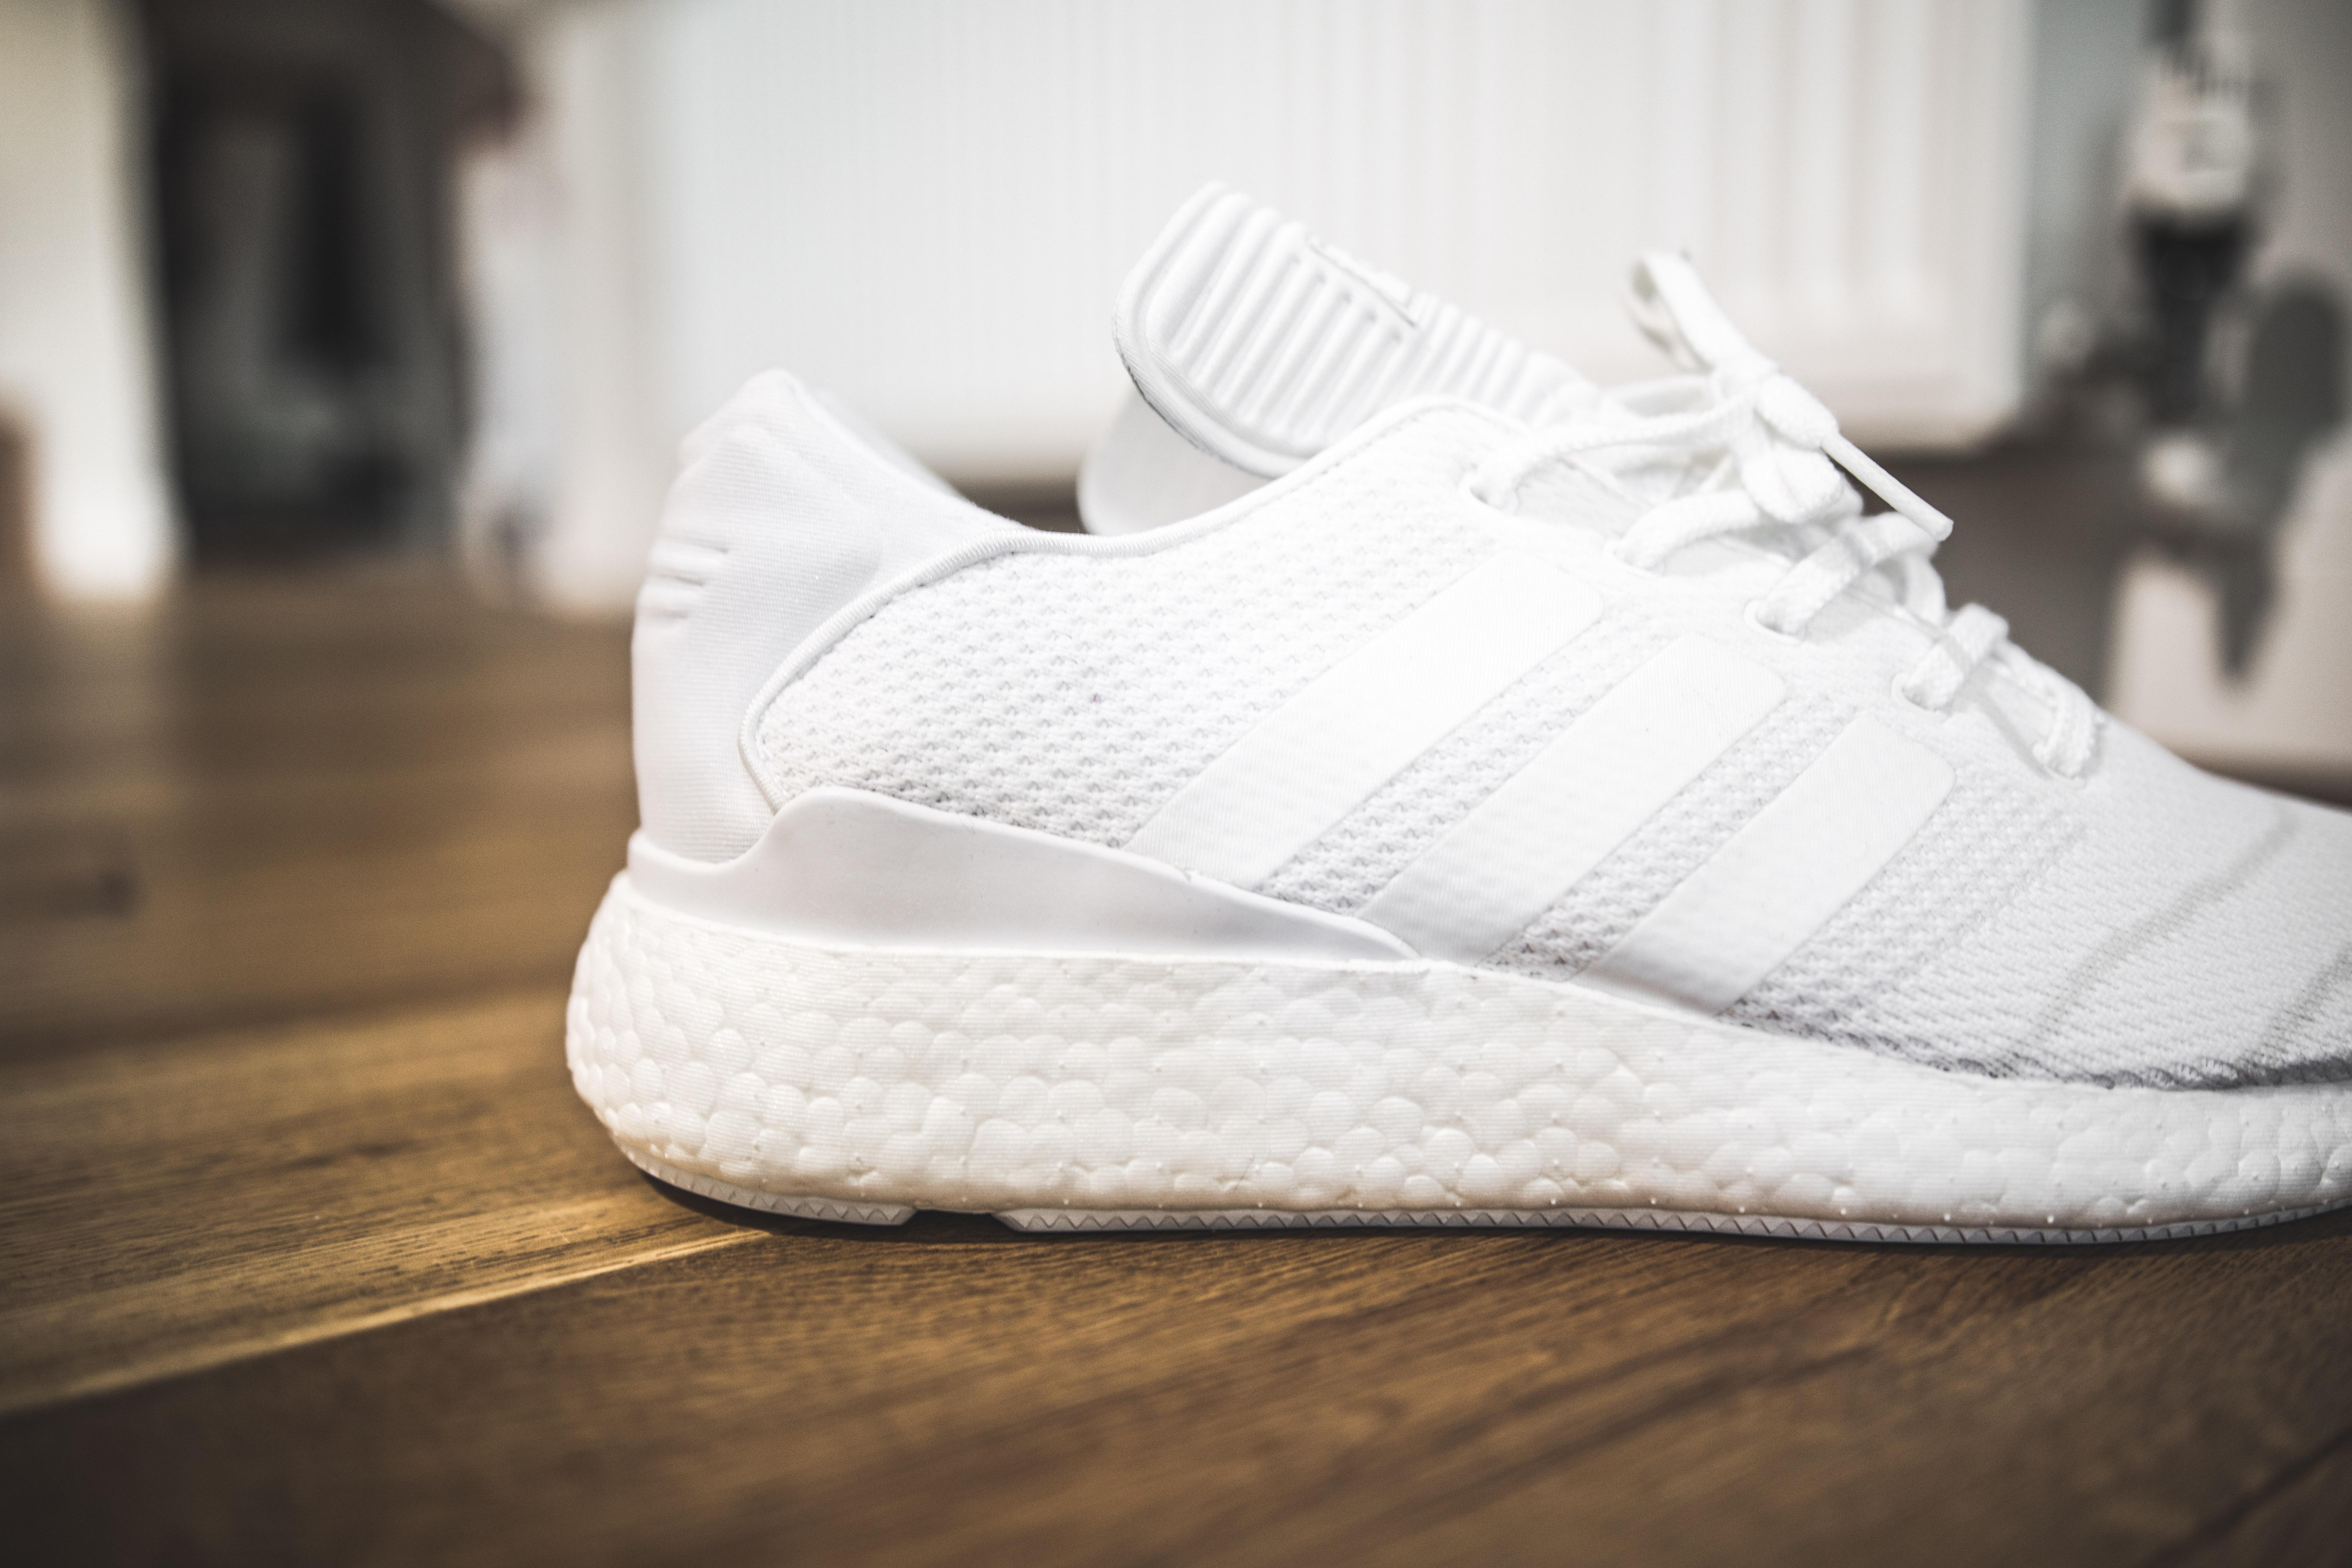 Sneakerfocus: adidas Busenitz Pure Boost